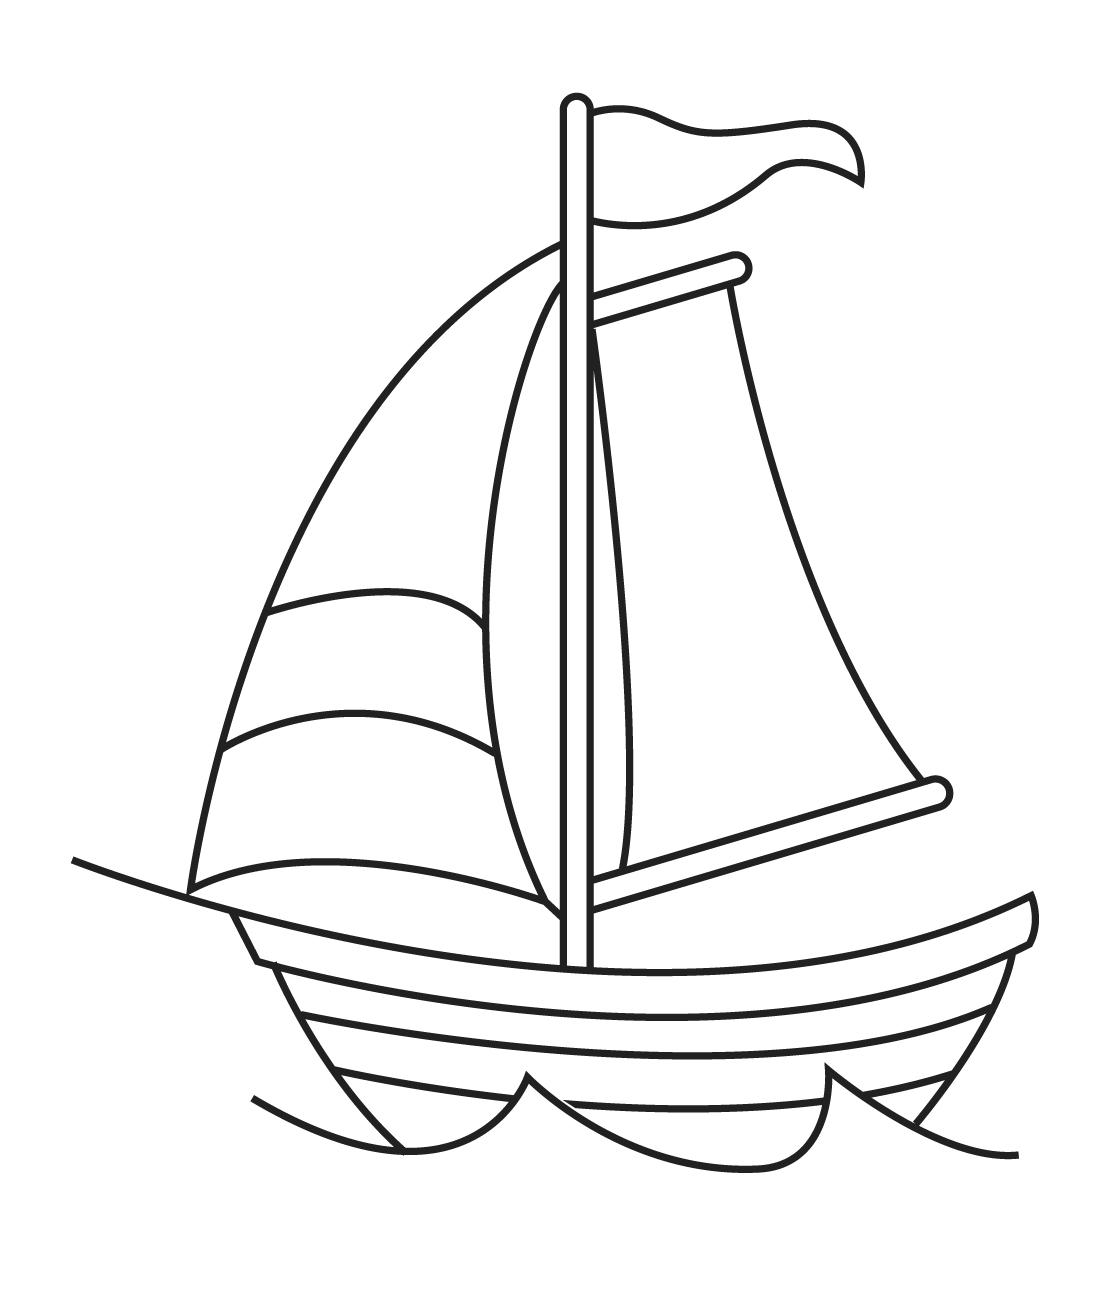 1119x1297 Drawn Oat Yacht